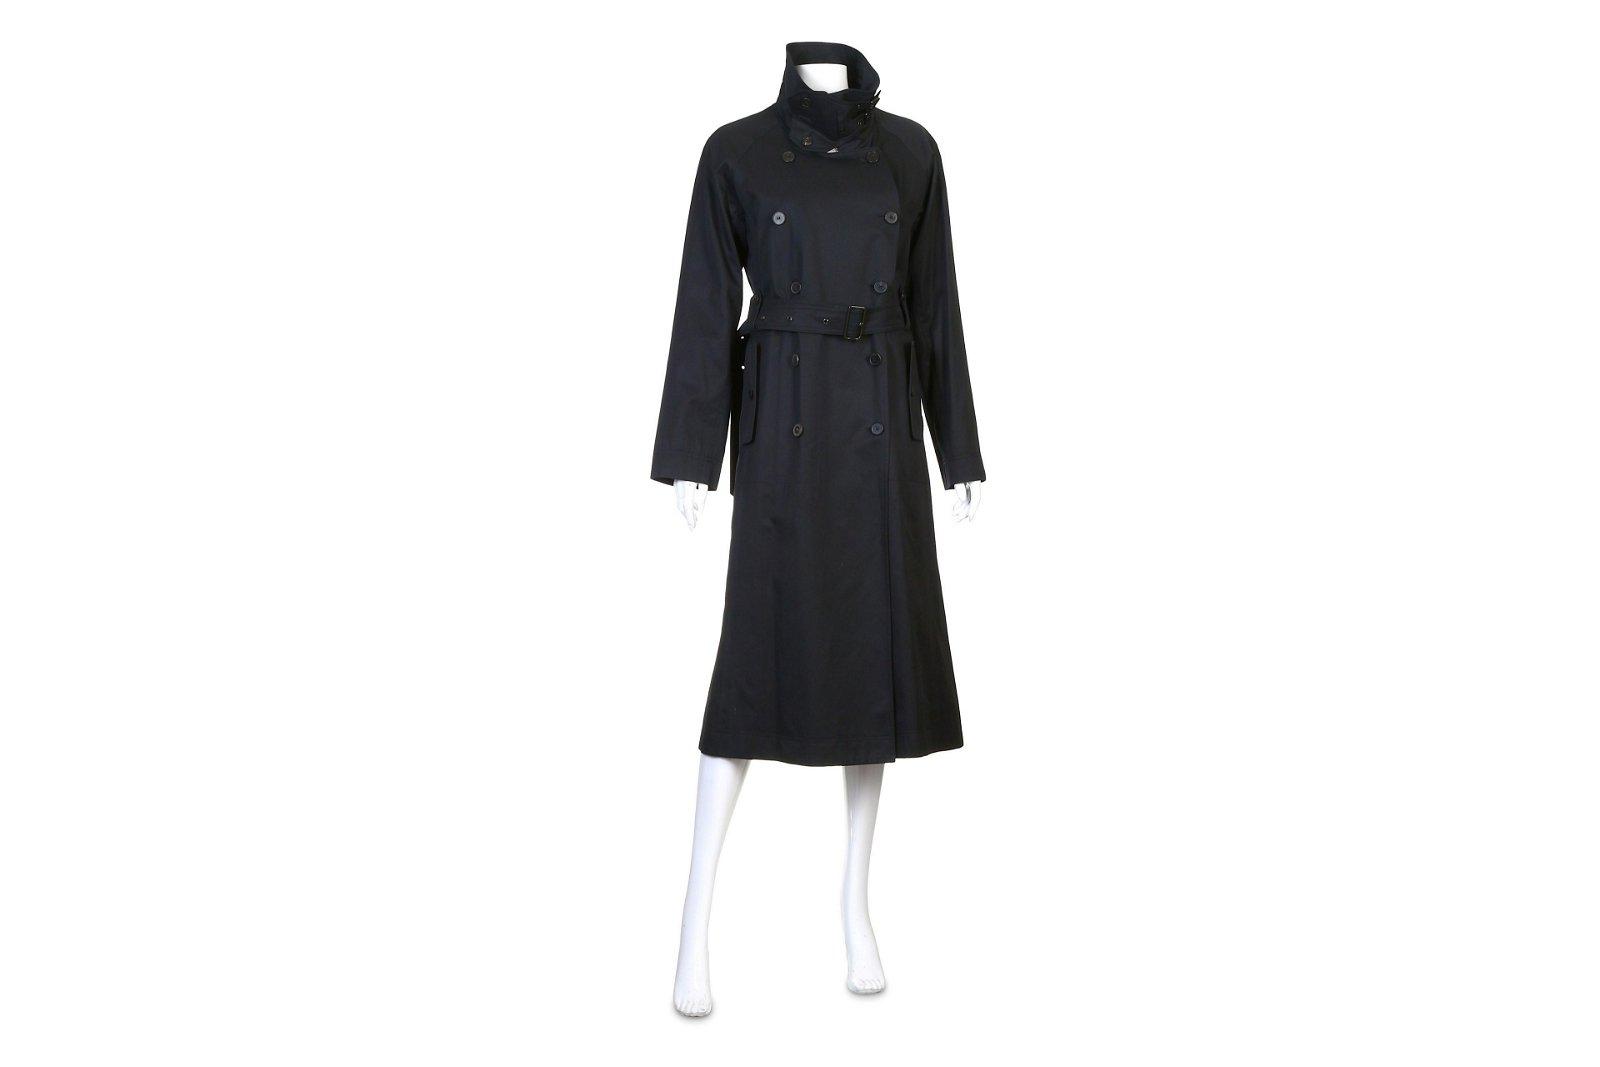 Yves Saint Laurent Black Cotton Trench Coat